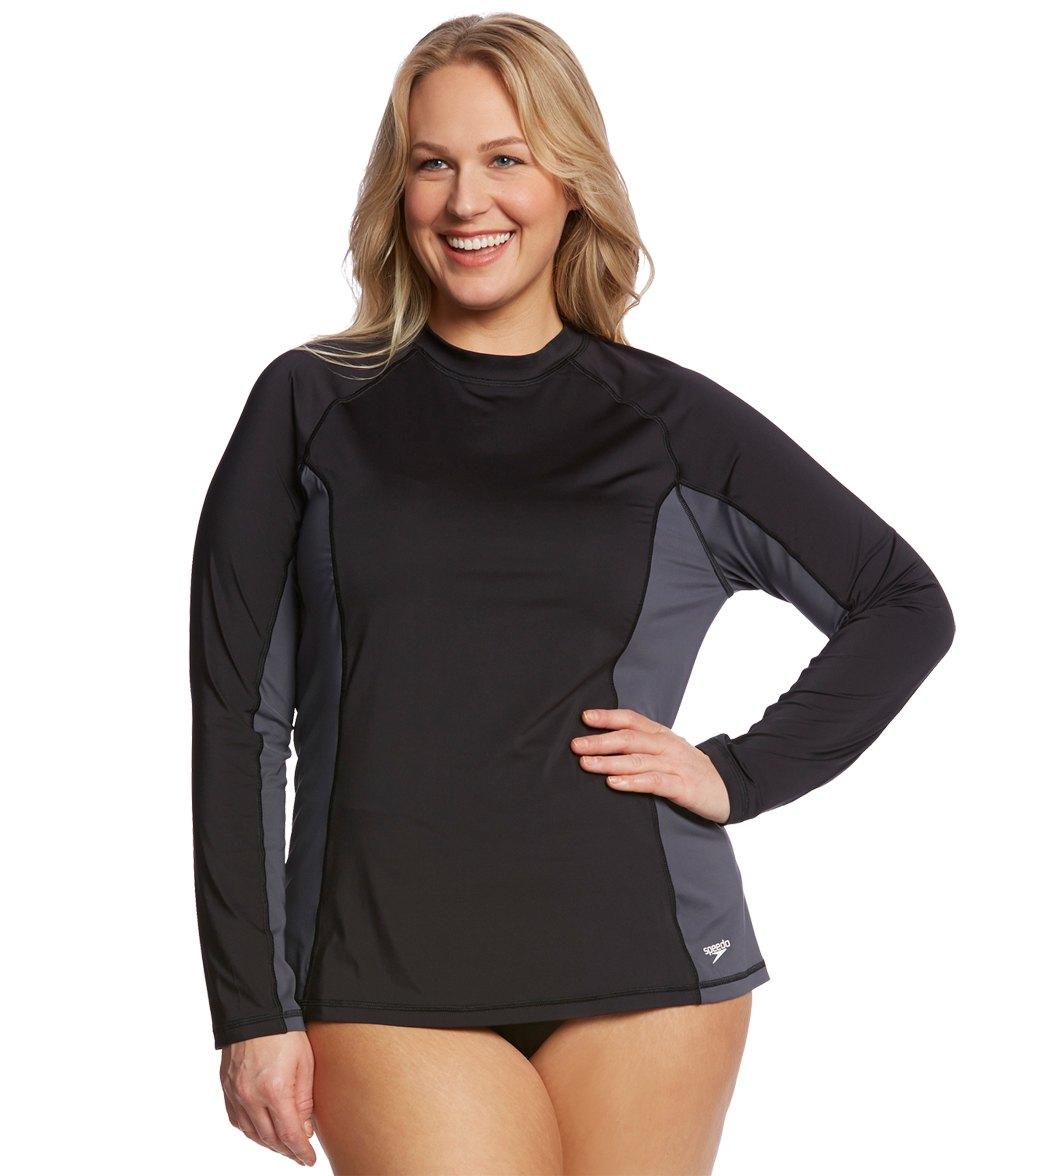 a785372dff ... Speedo Women's Long Sleeve Plus Size Rashguard. Play Video. MODEL  MEASUREMENTS